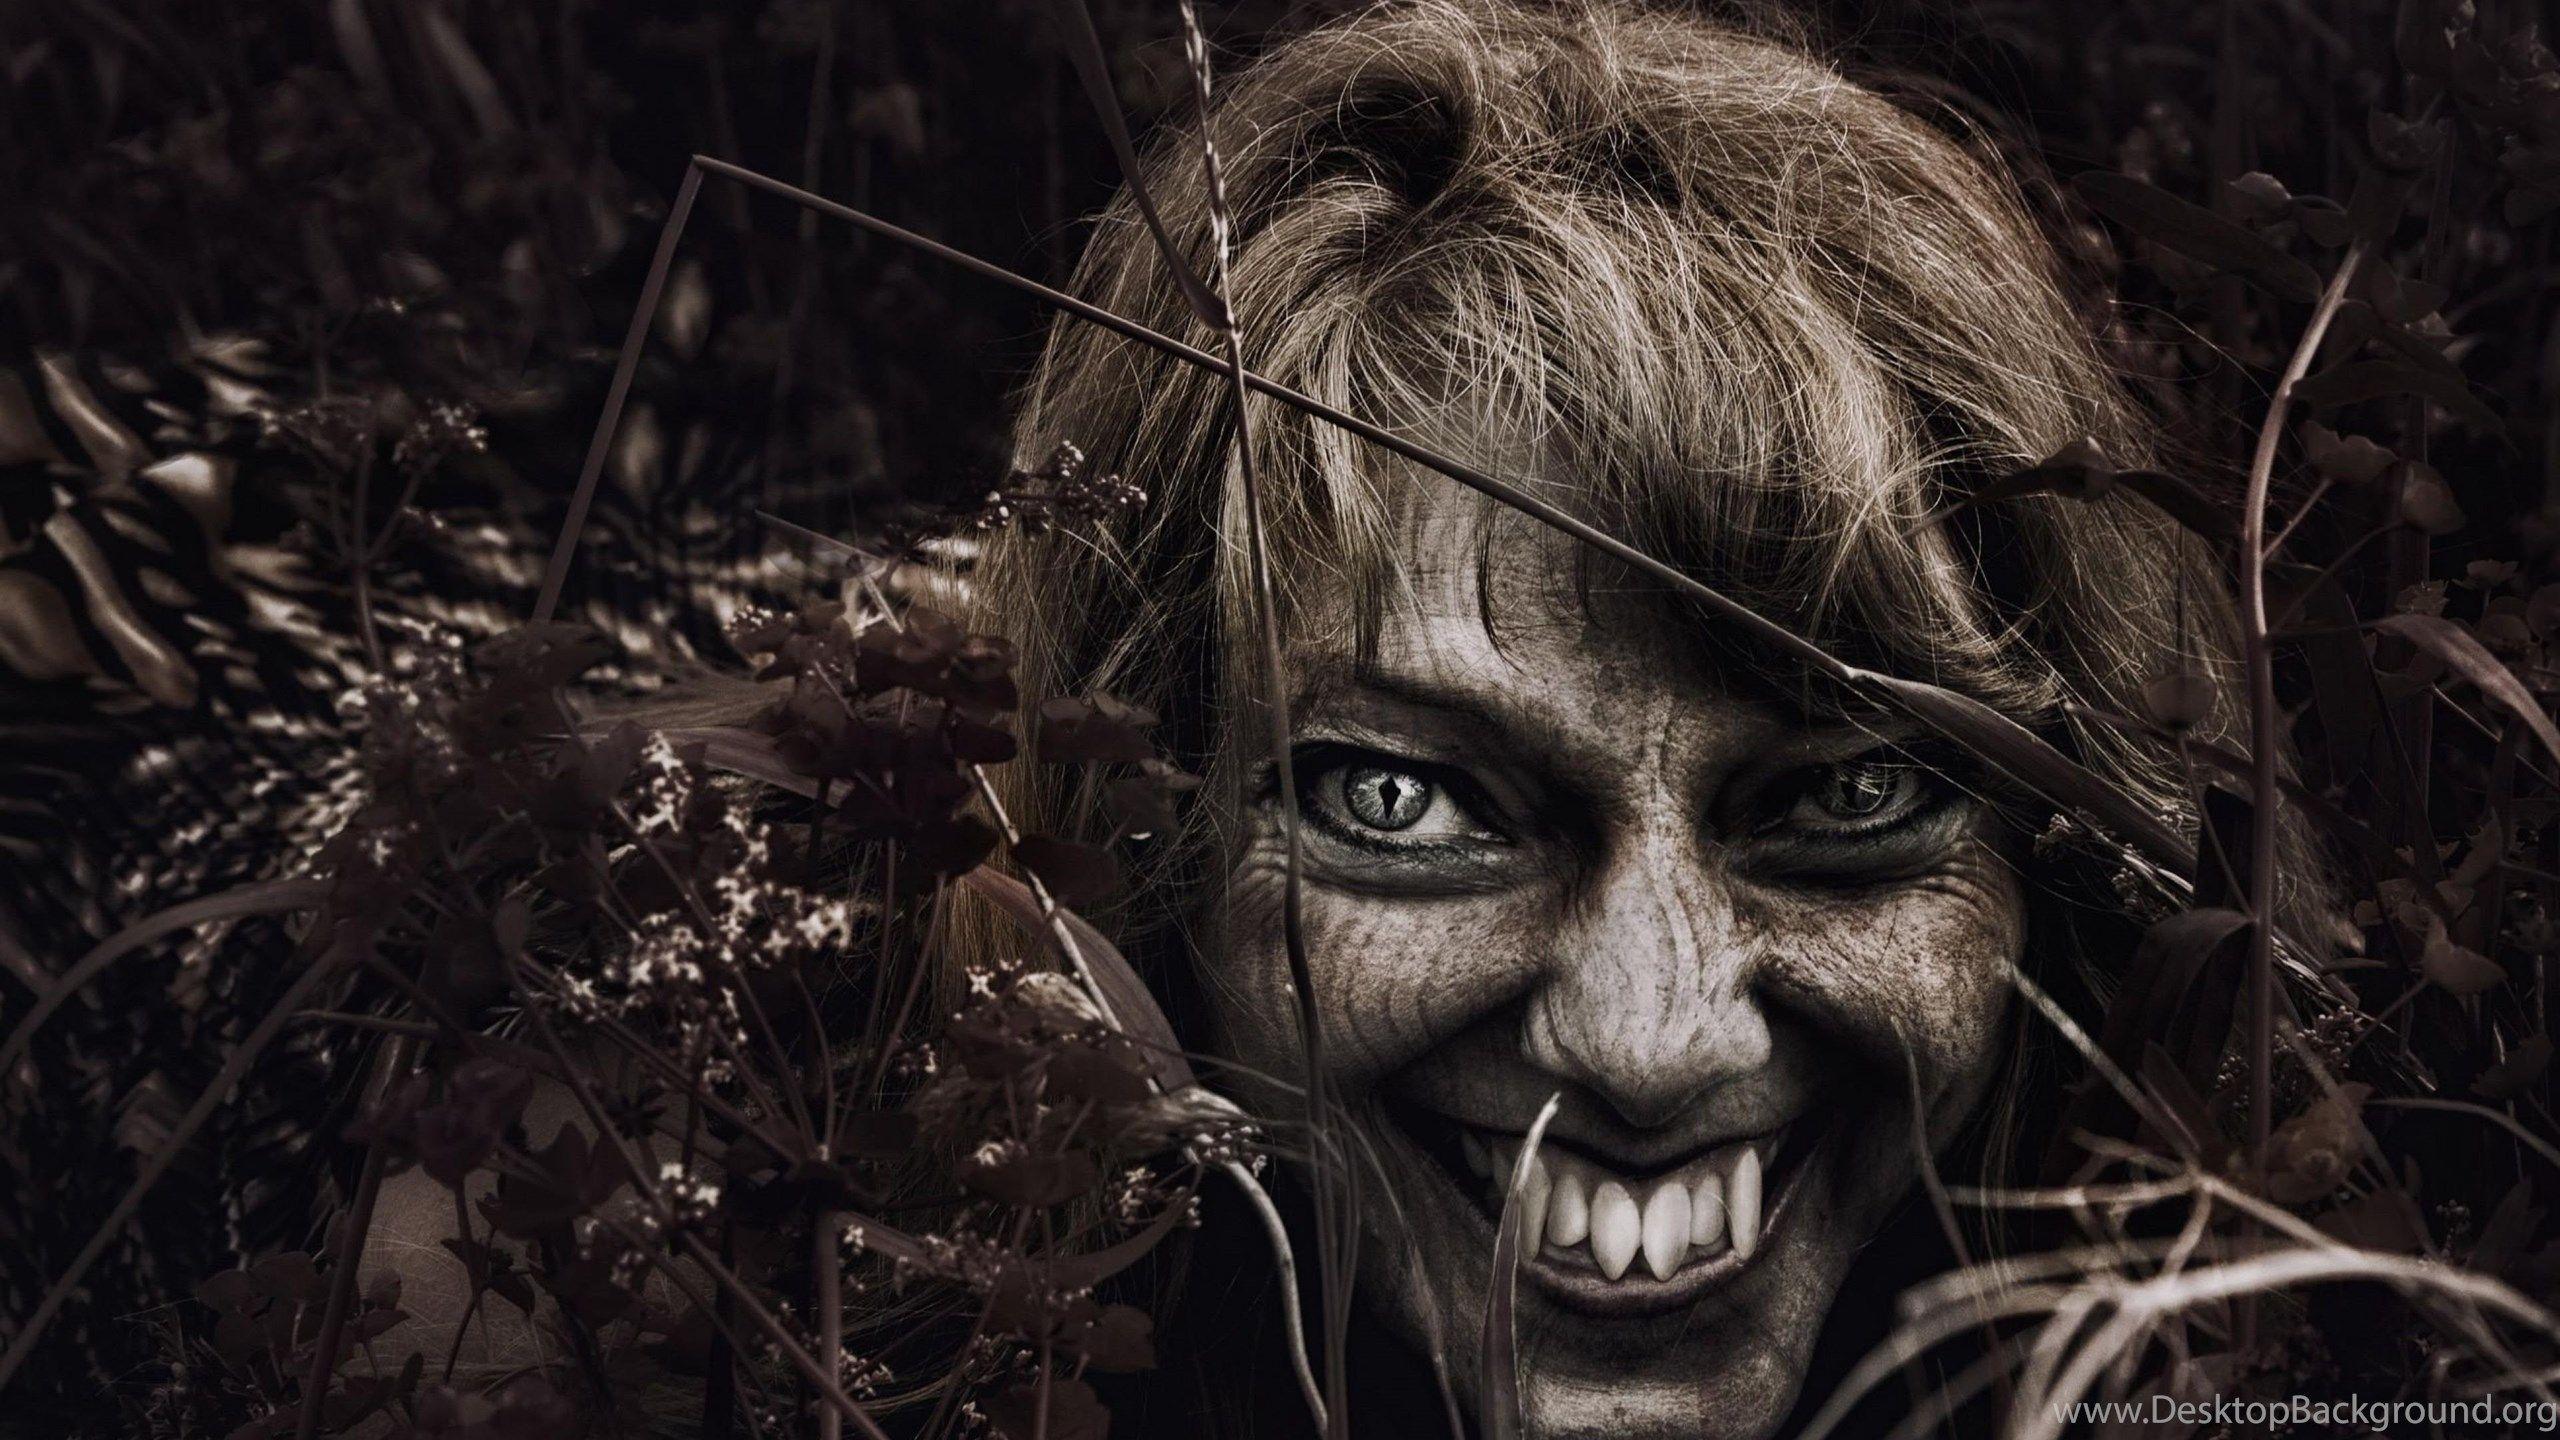 Evil Smile Wallpaper Scary wallpaper, Demon drawings